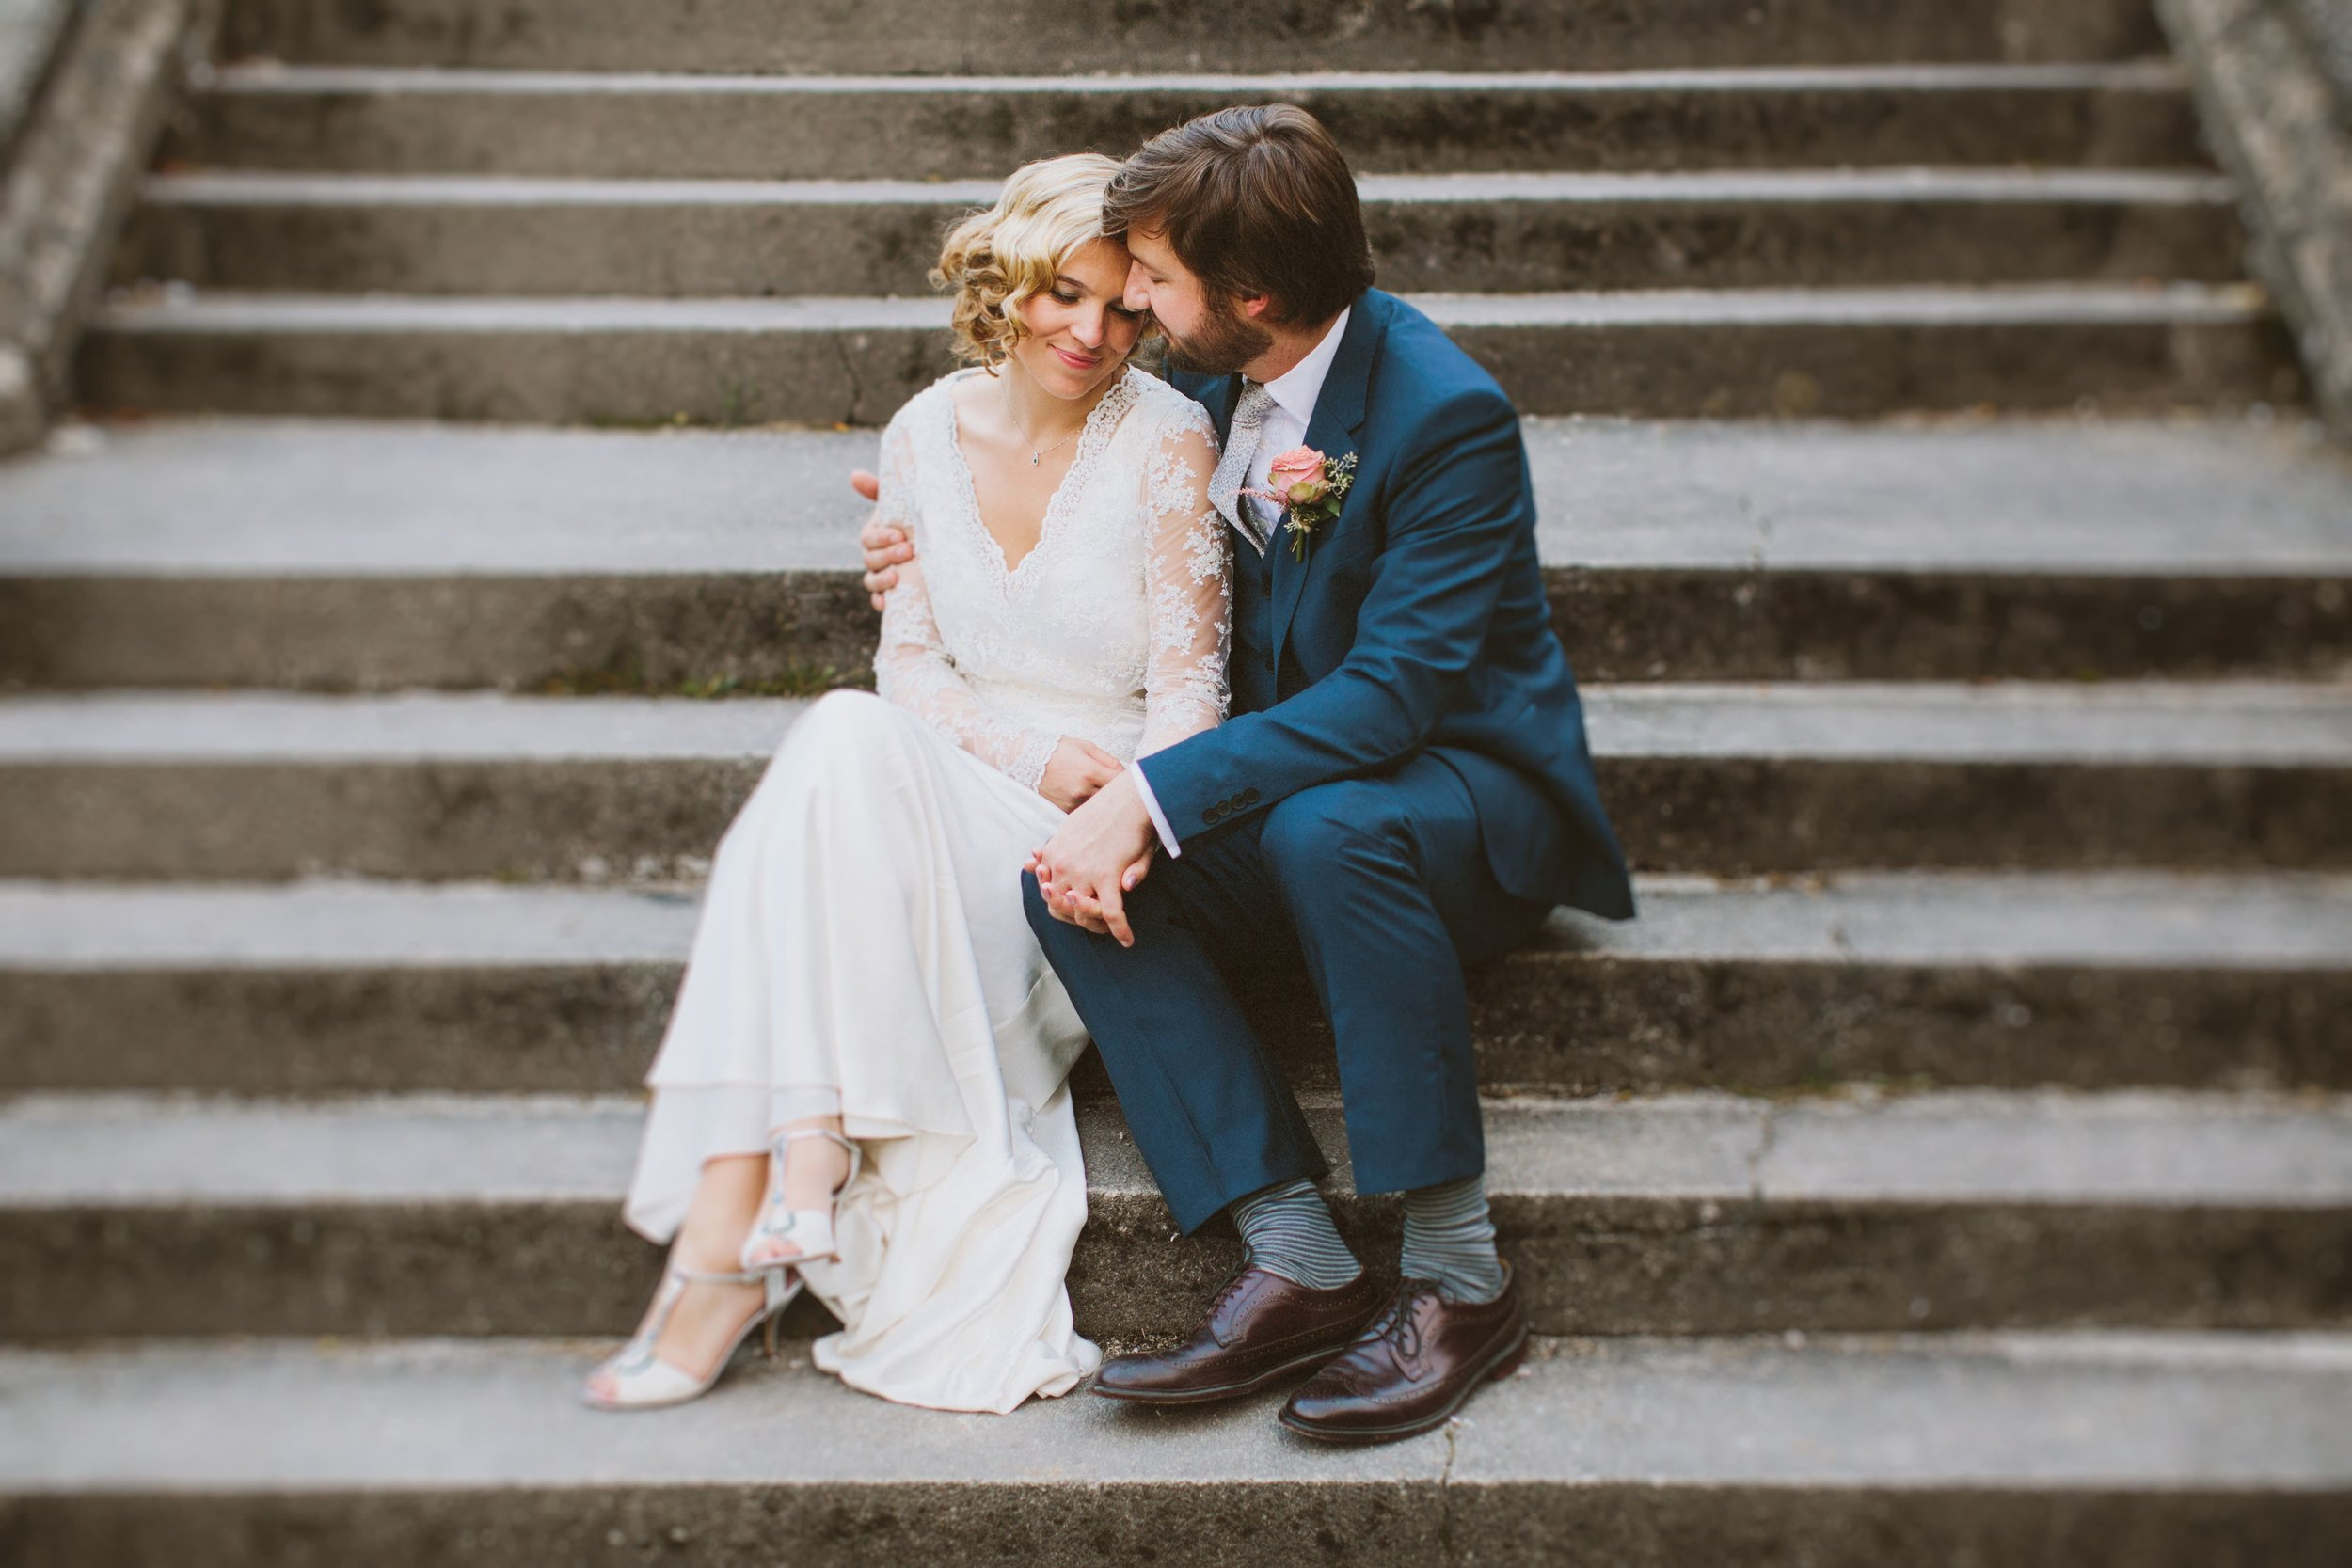 Jo-Peak-District-Autumn-Wedding-Bespoke-Vintage-Bias-Wedding-Gown-Lace-Jacket-Susanna-Greening-Matlock-16